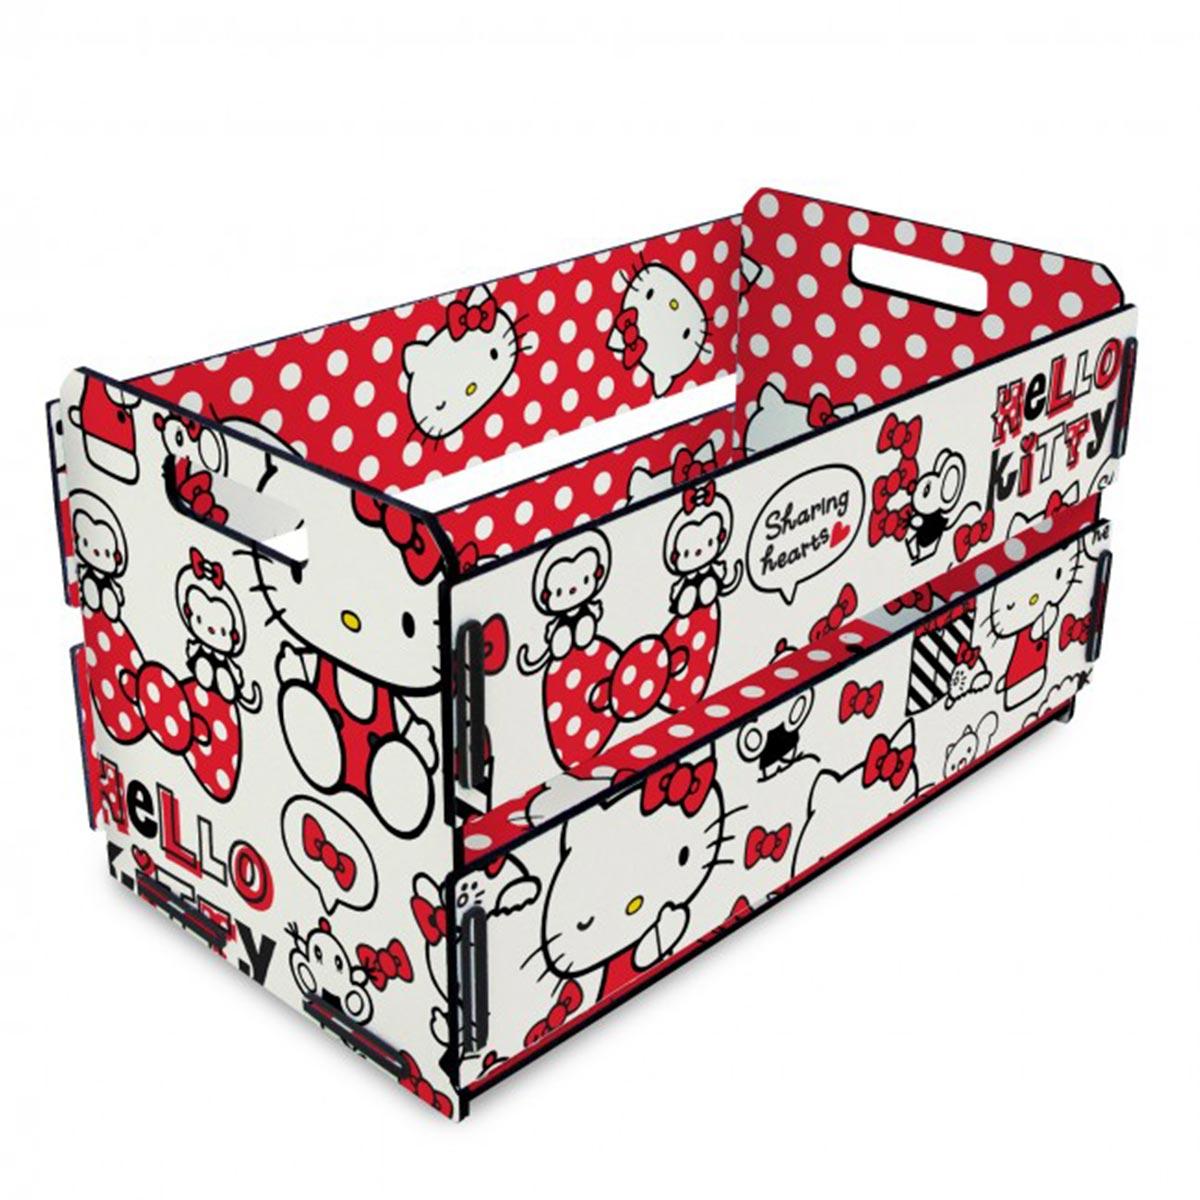 Caixote de Feira Hello Kitty Red Bow